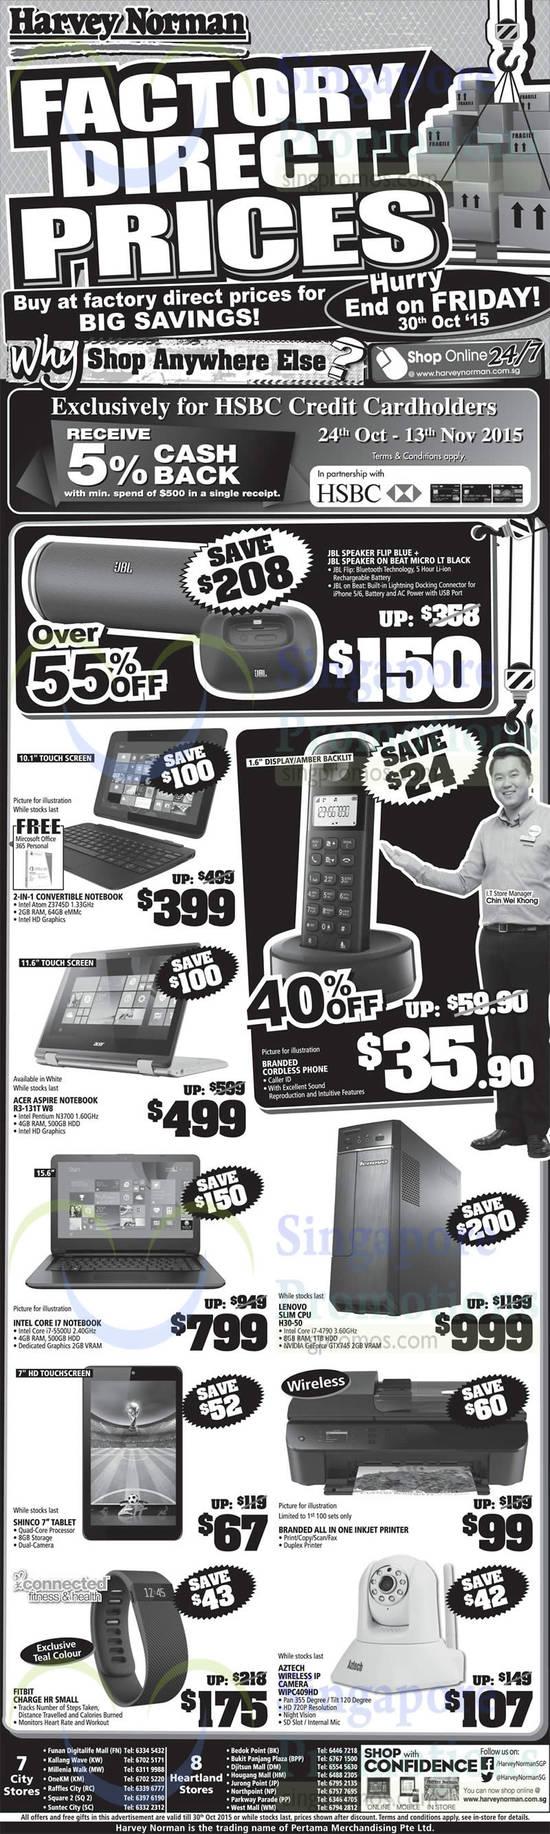 JBL Flip Blue Speaker, JBL On Beat Micro LT Black Speaker, Acer Aspire R3-131T W8 Notebook, Lenovo H30-50 CPU, Fitbit Charge HR Small Activity Tracker, Aztech WIPC409HD Wireless IP Camera